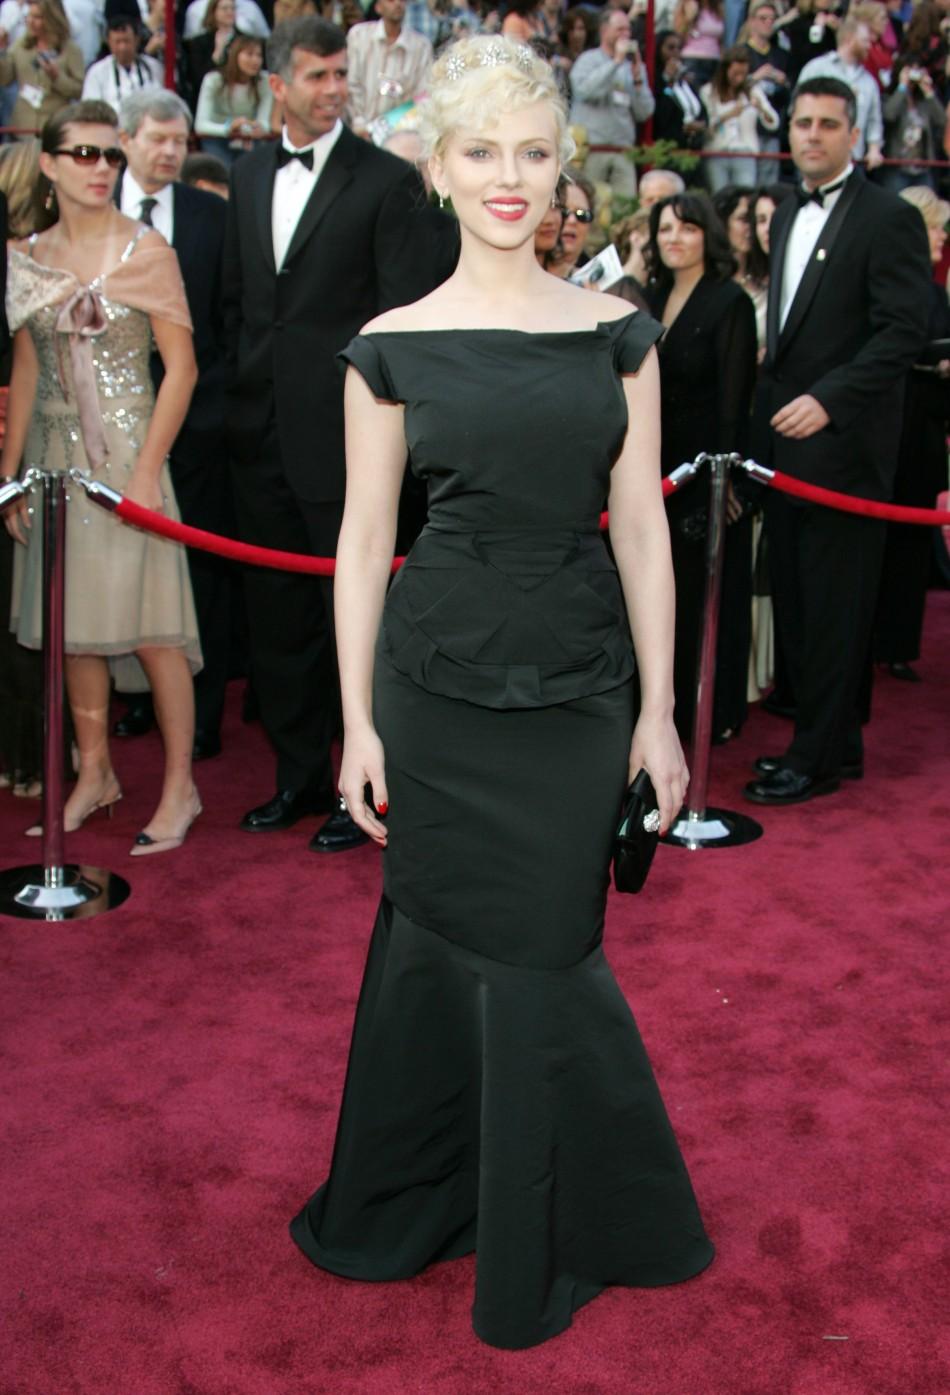 Actress Scarlett Johansson arrives at the 77th annual Academy Awards.